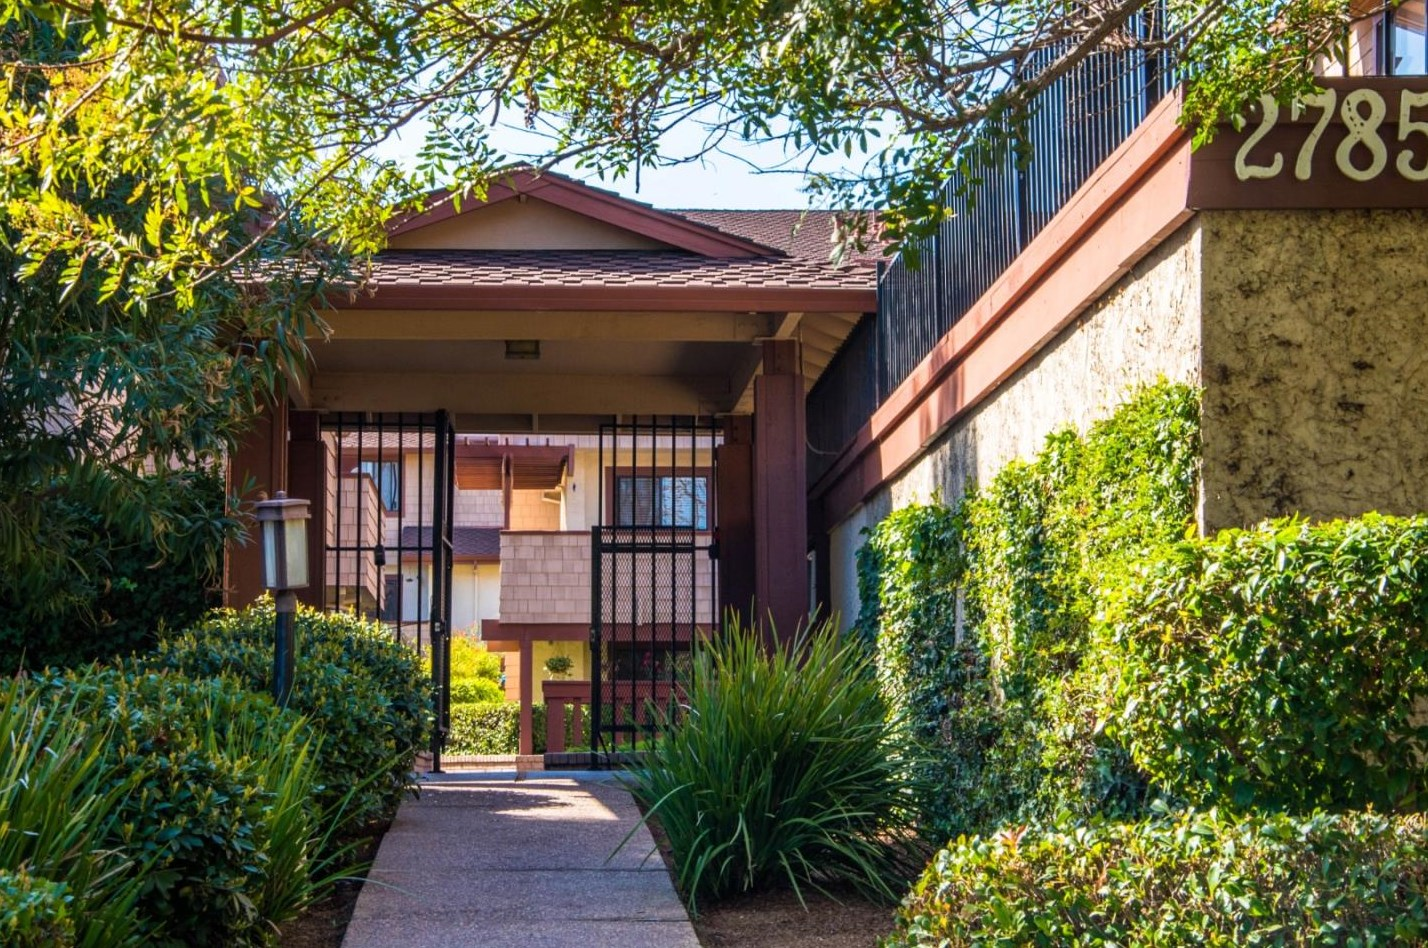 2785 S Bascom Ave 68, Campbell, CA 95008